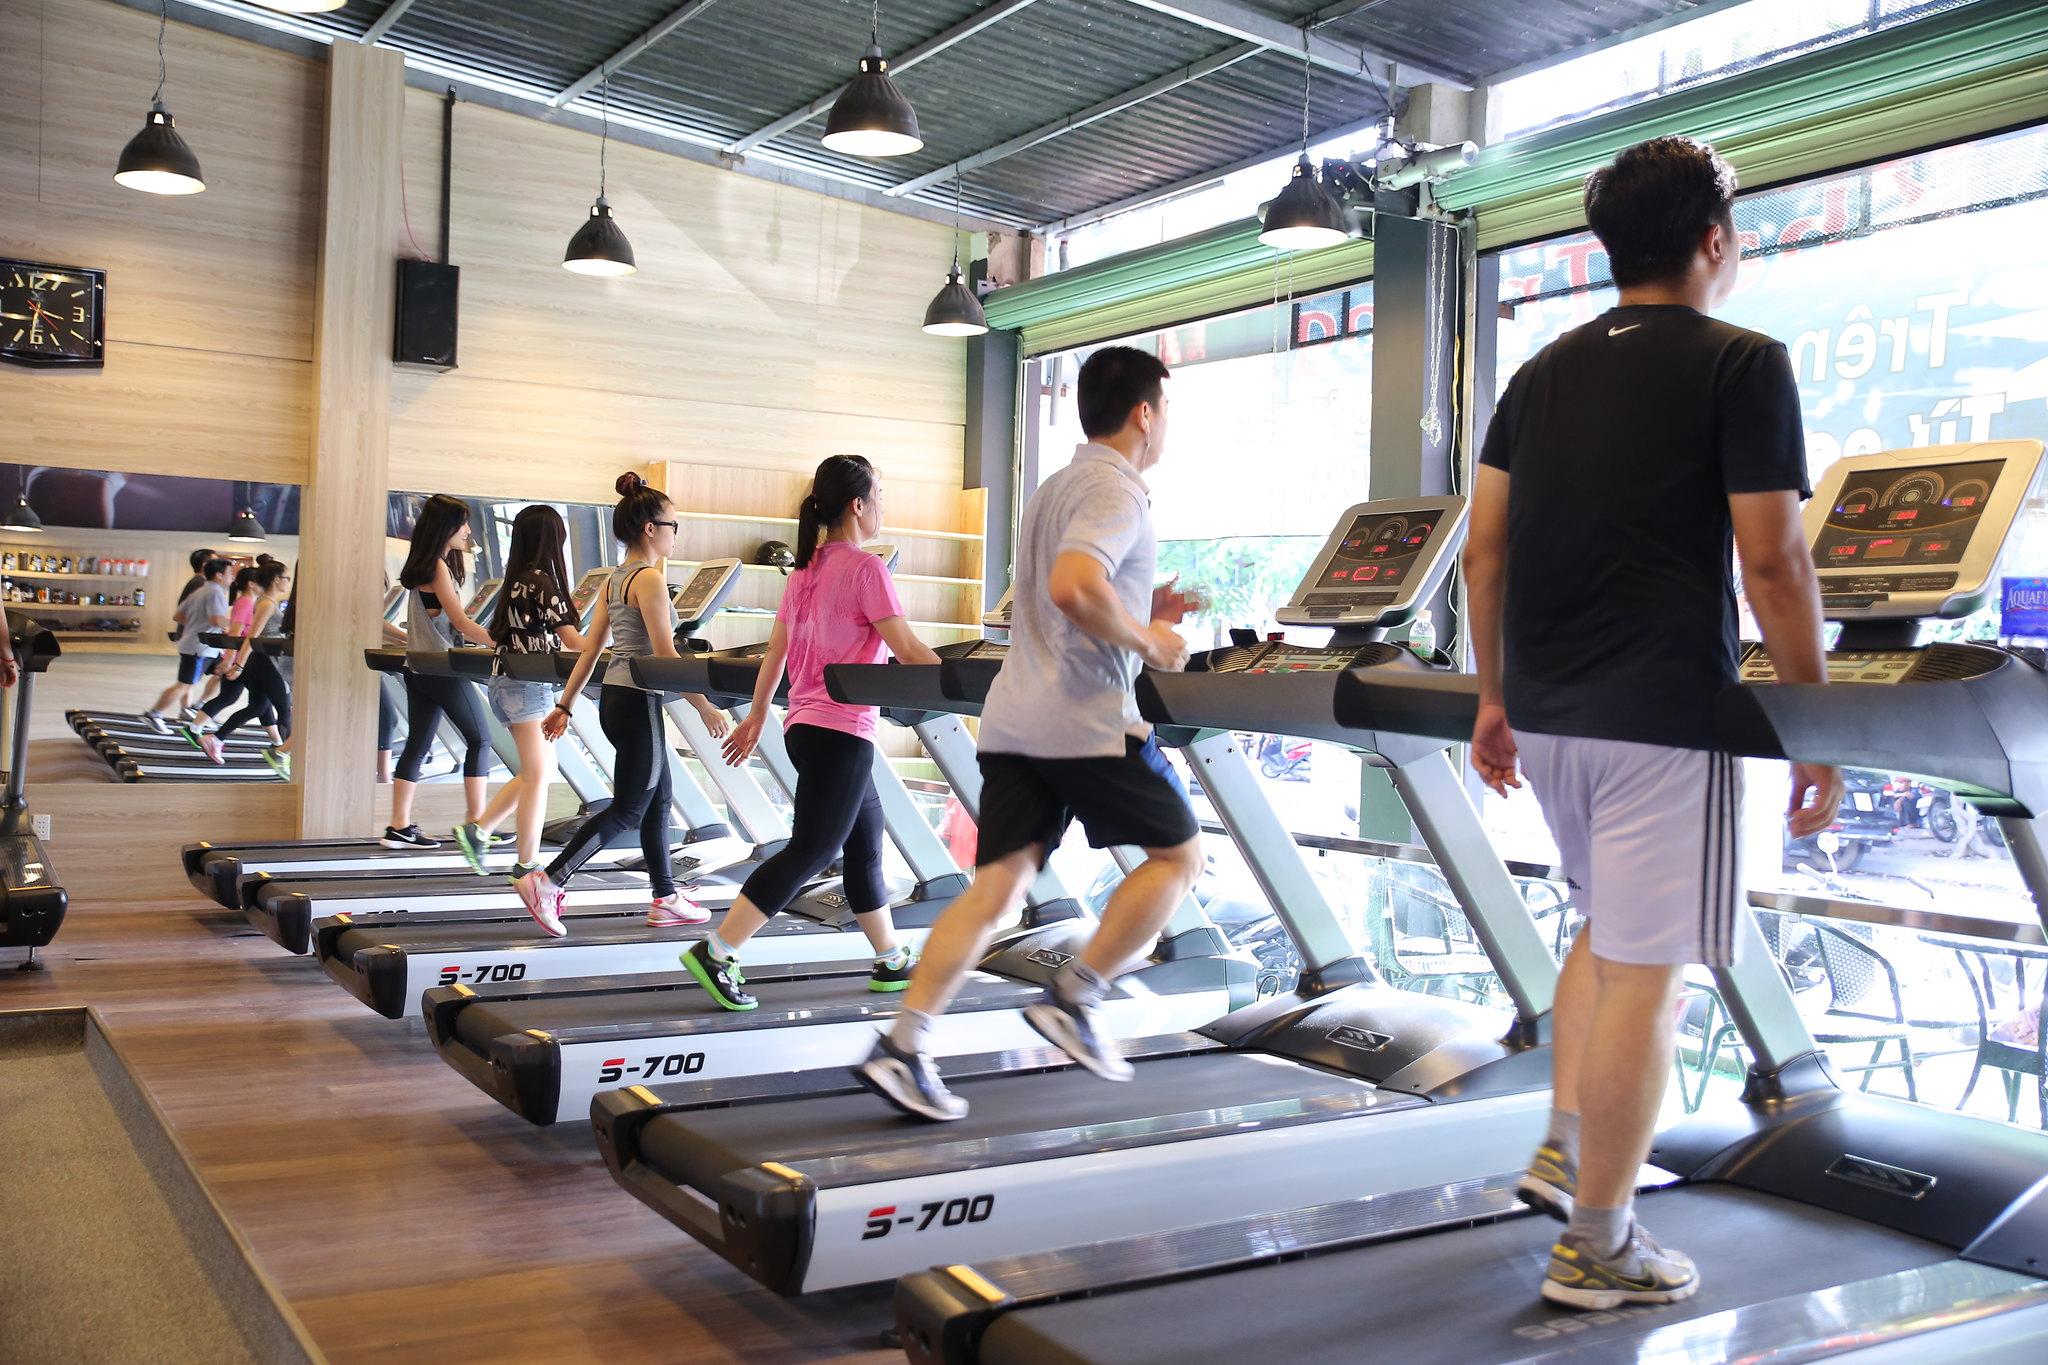 Olympic Nha Trang Gym  U0026 Fitness  Clb Th U1ec3 H U00ecnh Nam  U0026 Th U1ea9m